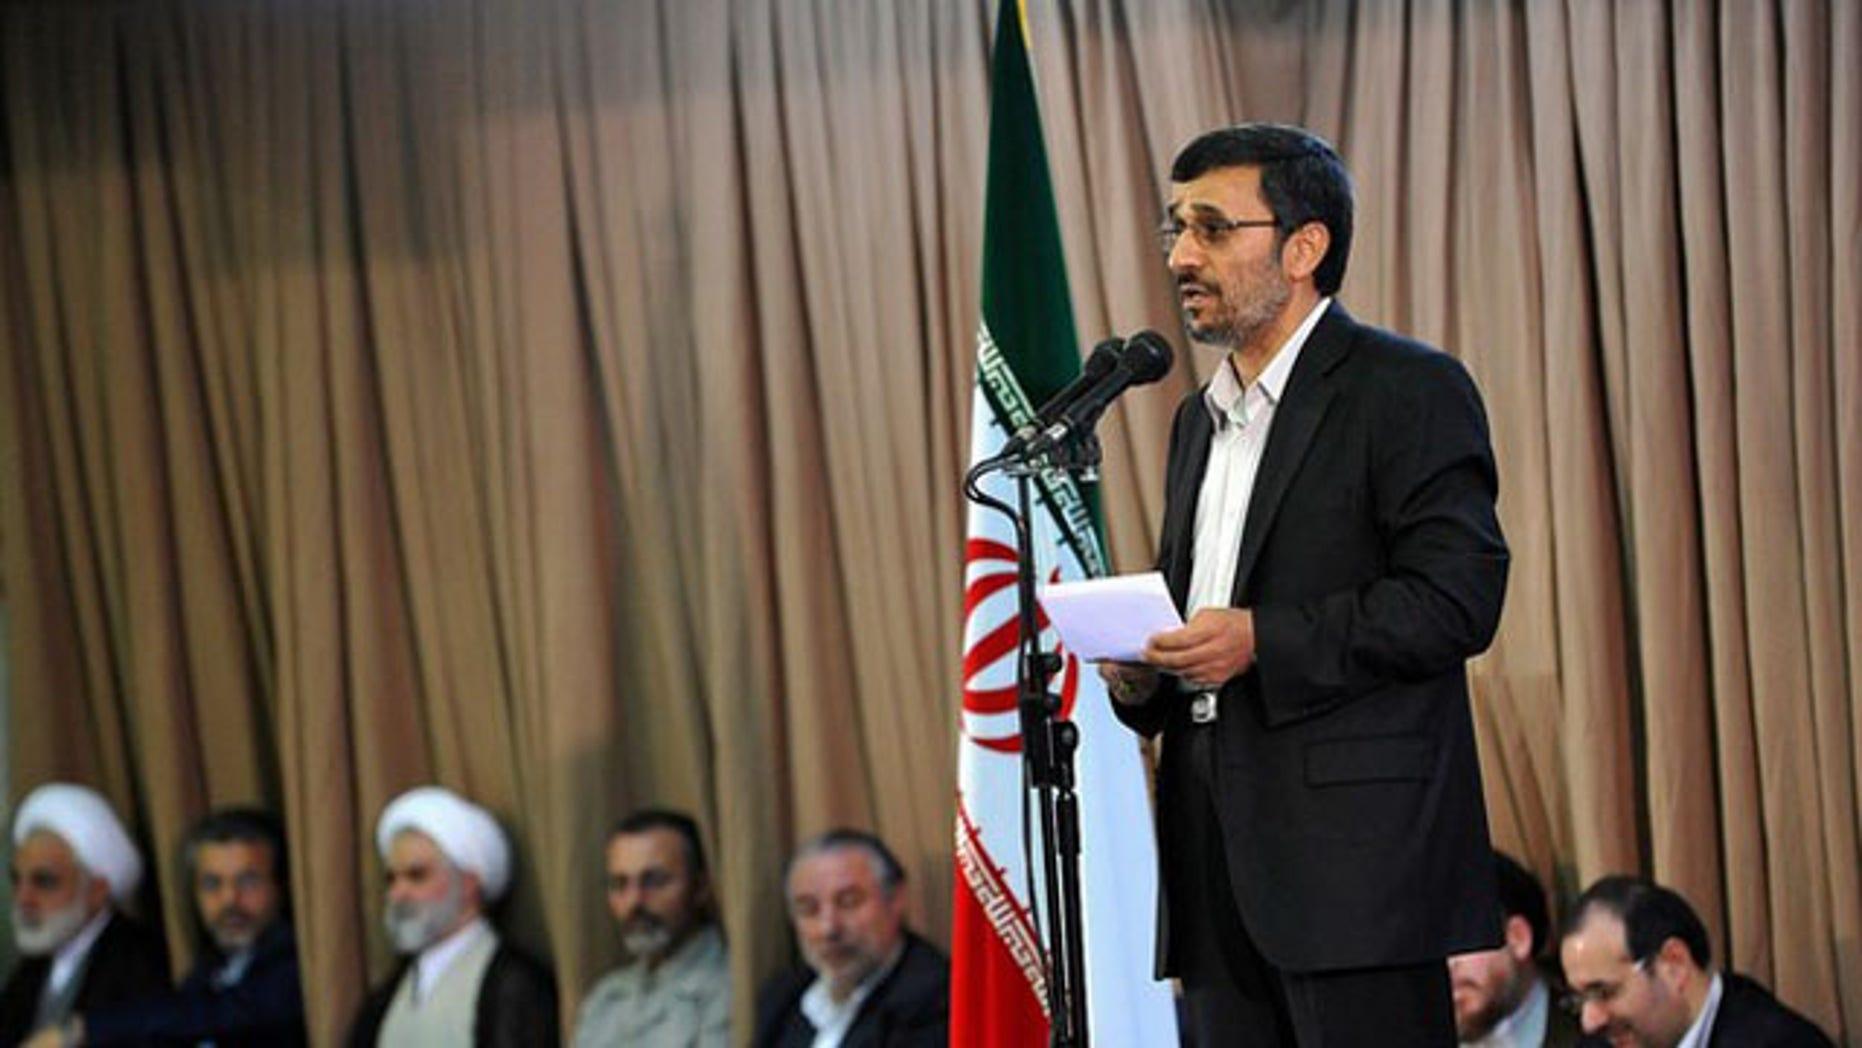 Aug. 2010: Iran's President Mahmoud Ahmadinejad speaks during a meeting with Iran's Supreme Leader Ayatollah Ali Khamenei in Tehran.